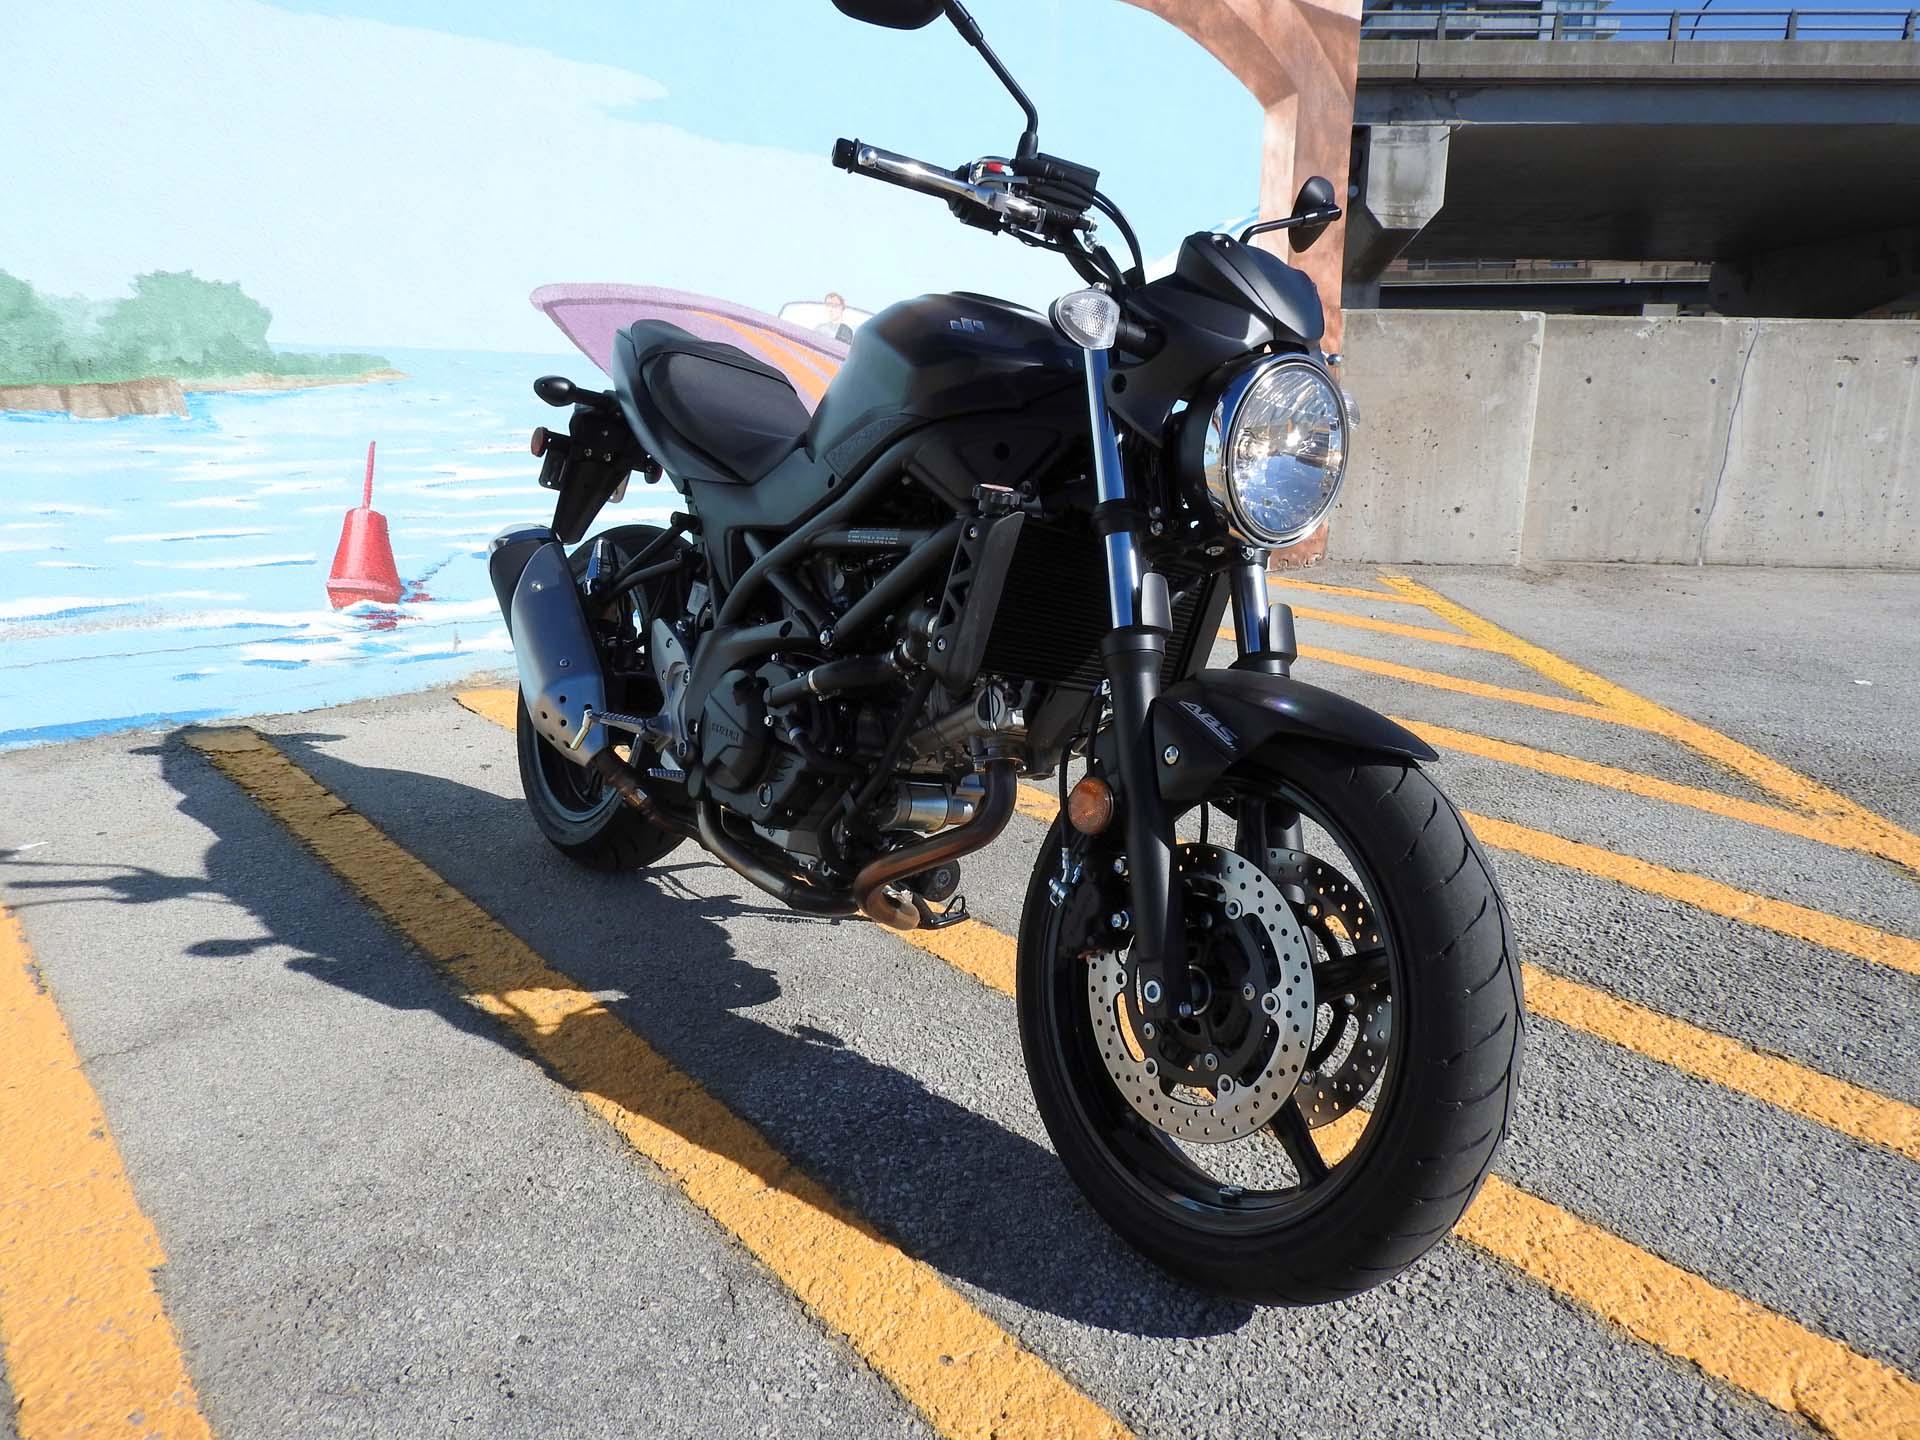 Suzuki SV650 – retro motorcycle